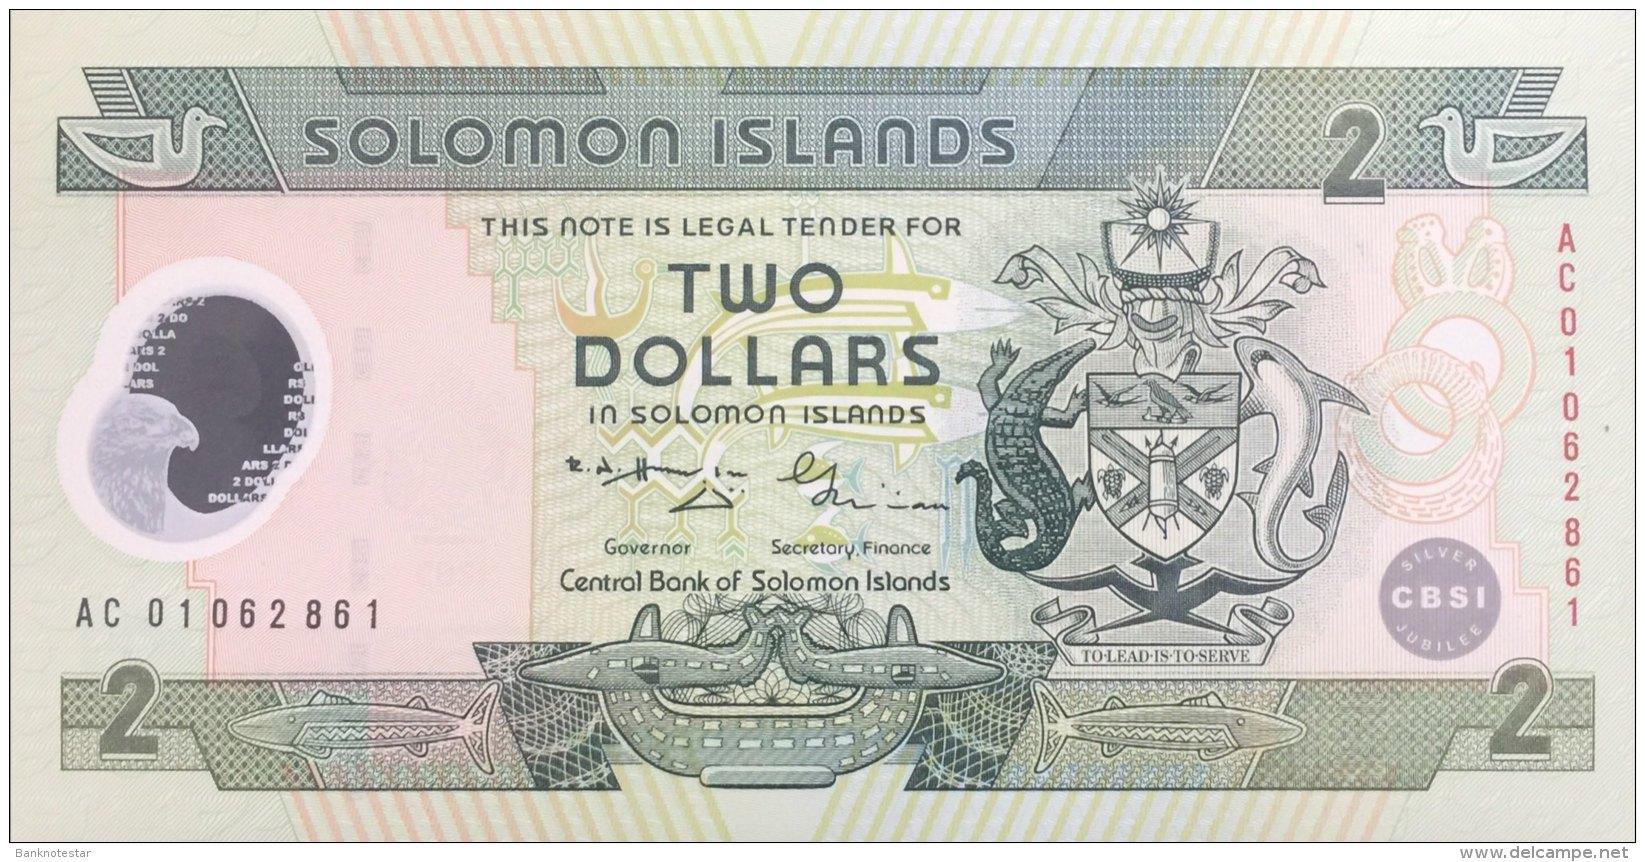 Solomon Islands 2 Dollars, P-23 (2001) - 25 Years Central Bank Note - UNC - Salomons